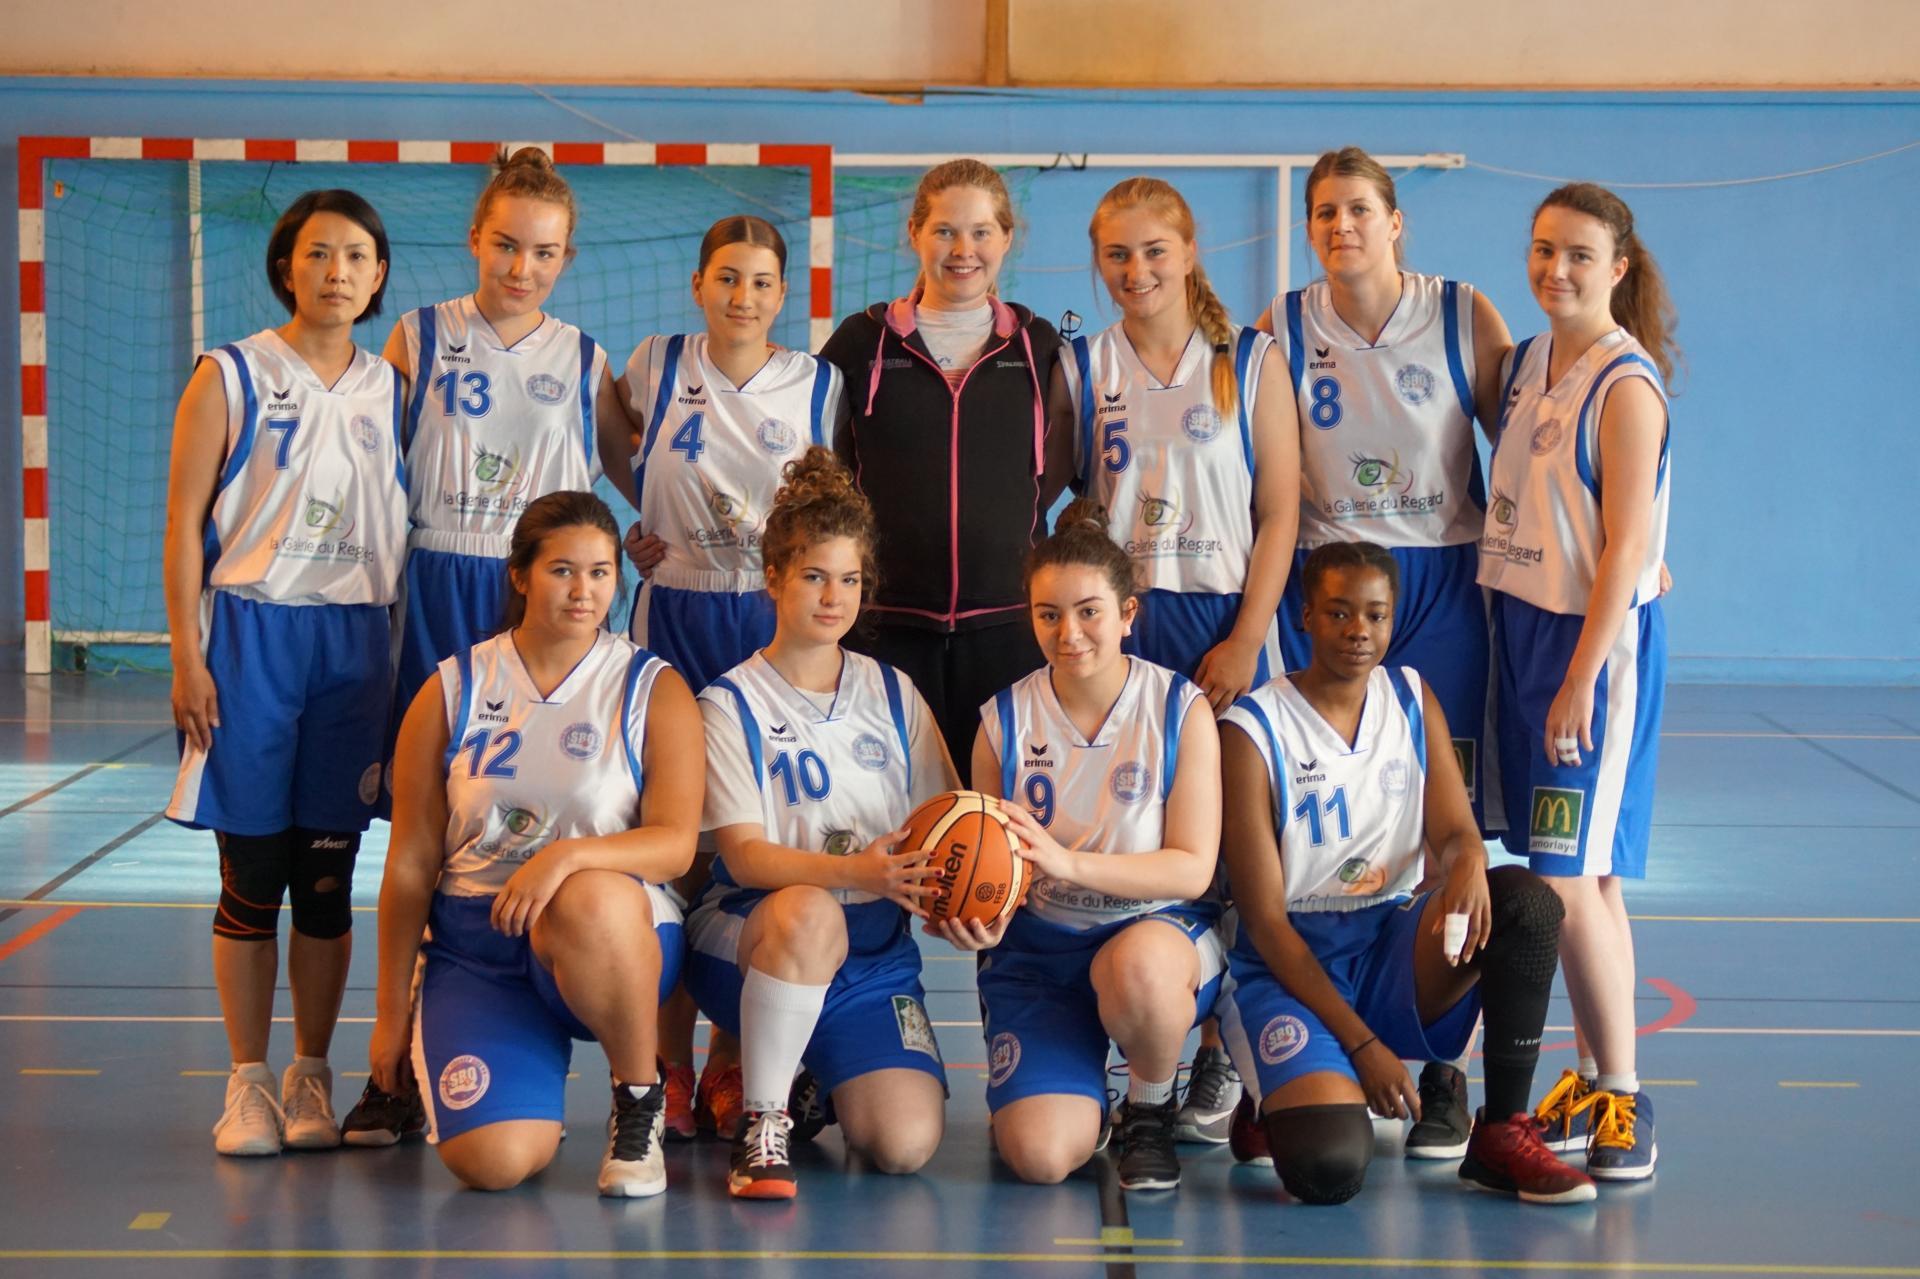 Seniors filles Sud basket Oise Saison 2018-2019